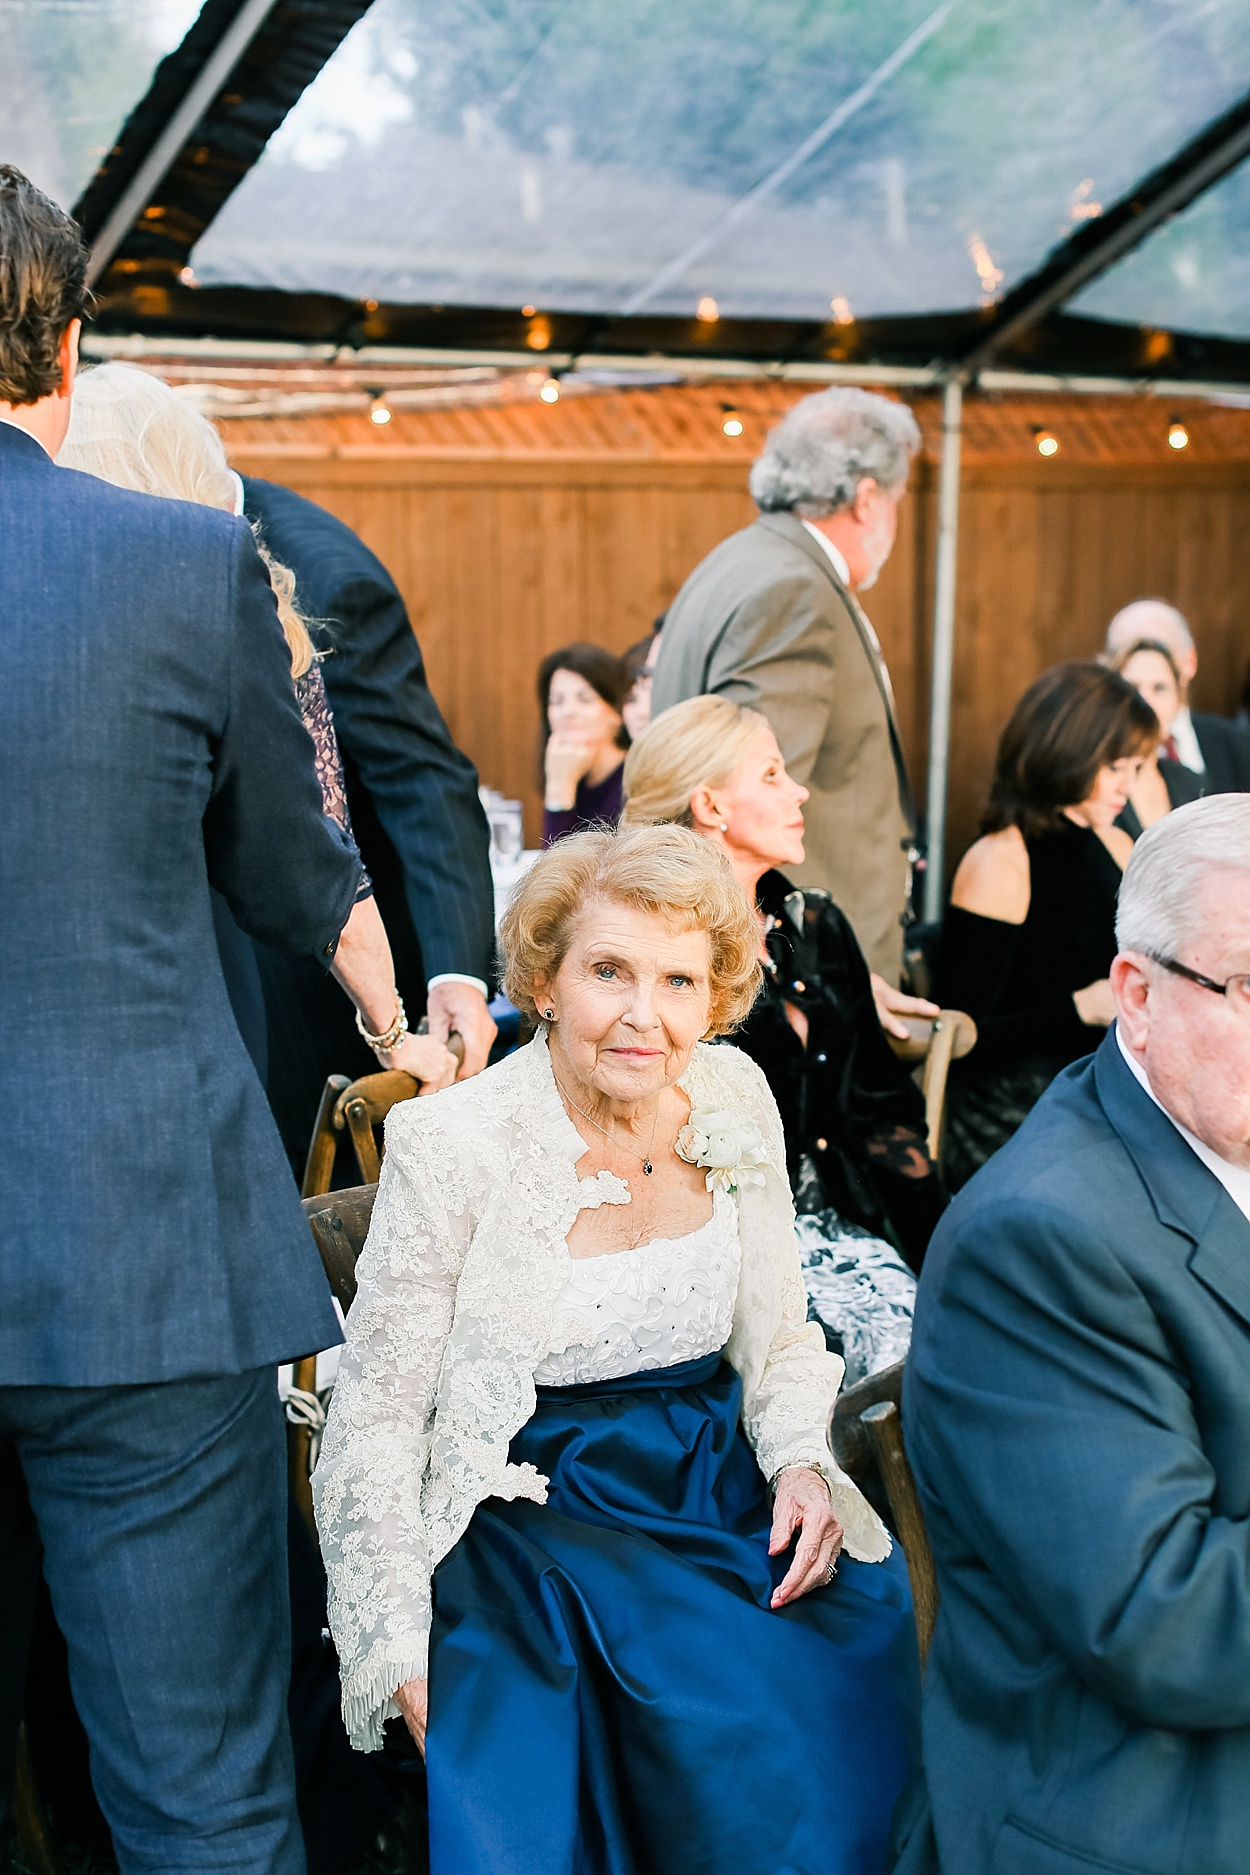 DFW Backyard Wedding